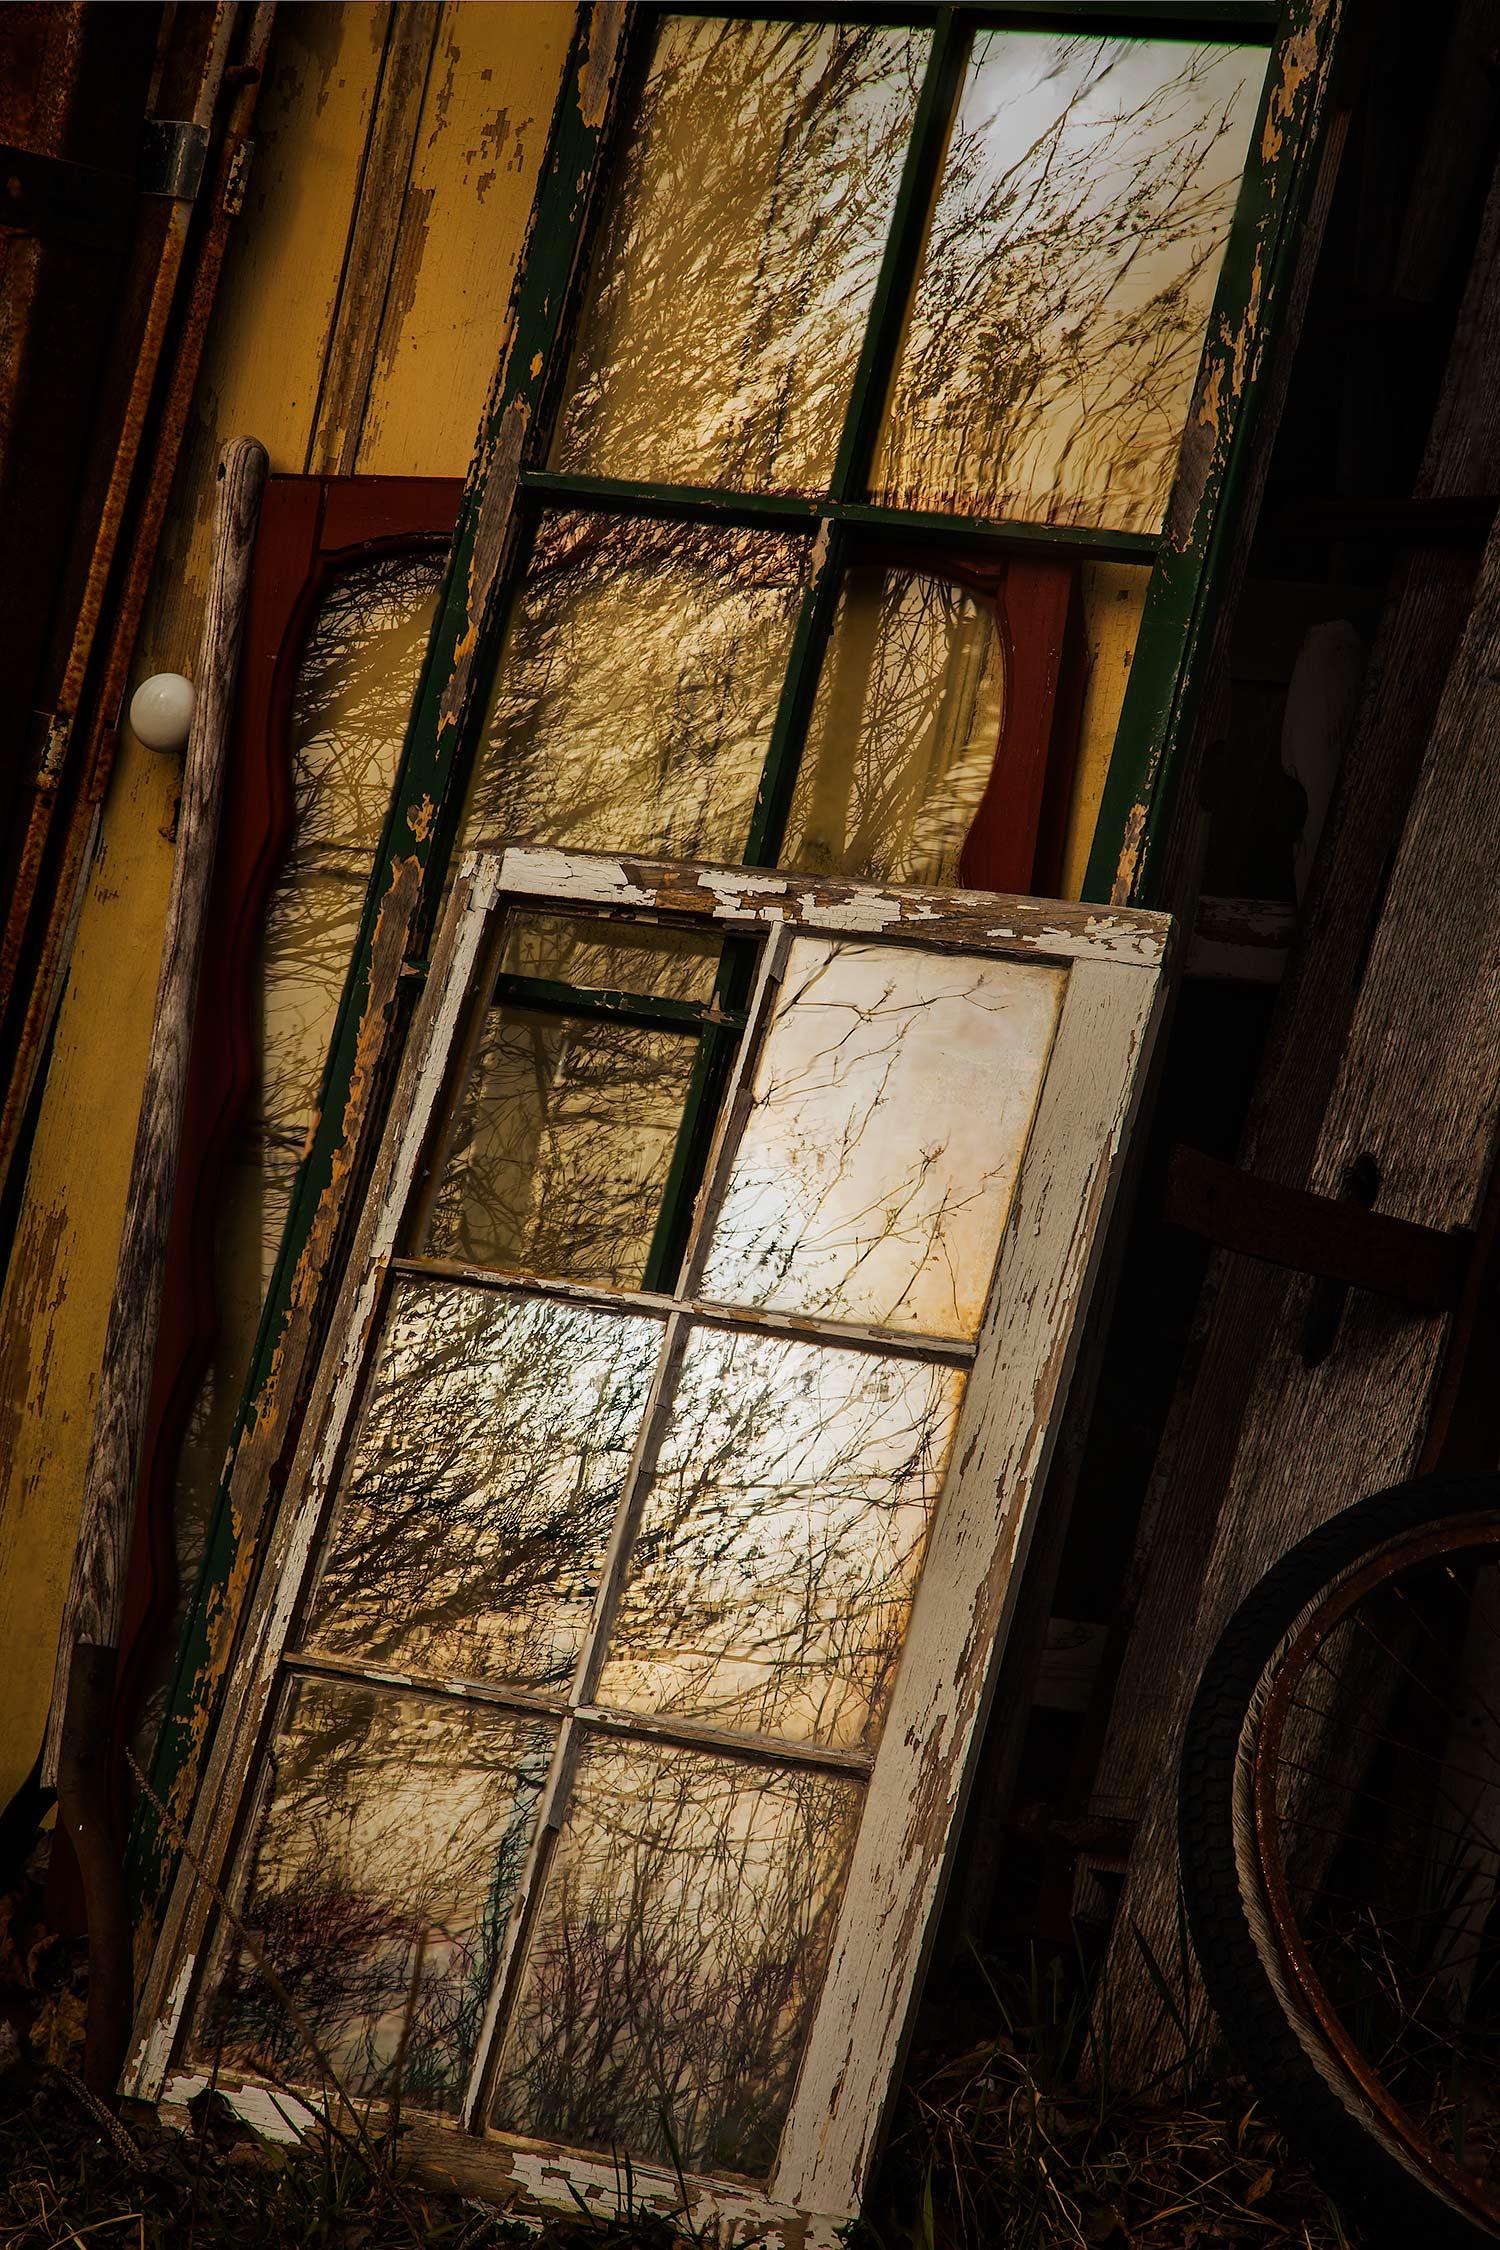 Window and Doors, Bar Harbor, Maine, 2014